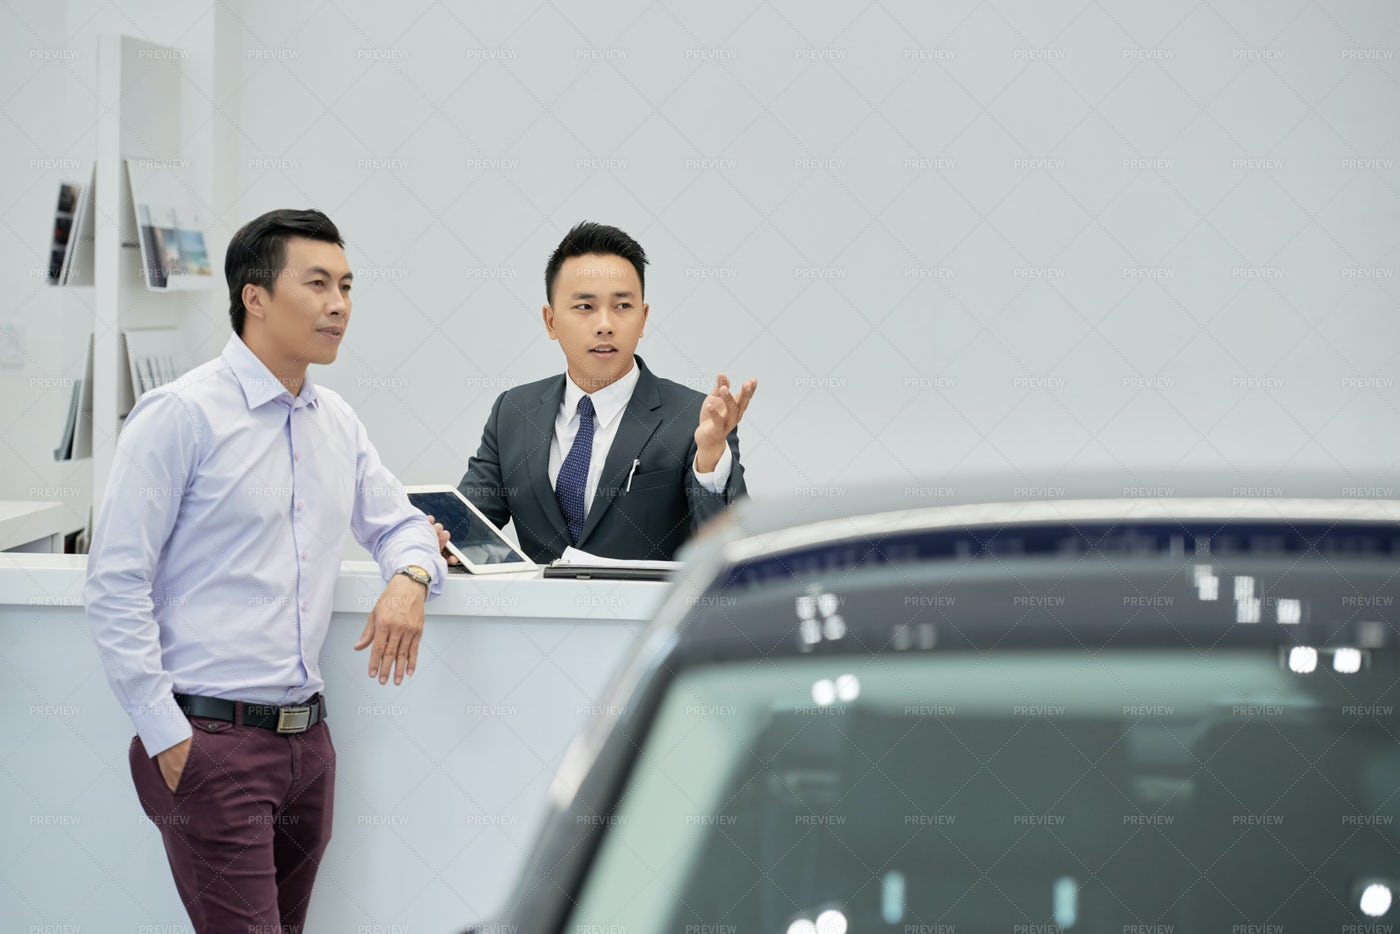 Salesman Showing Cars To Customer: Stock Photos